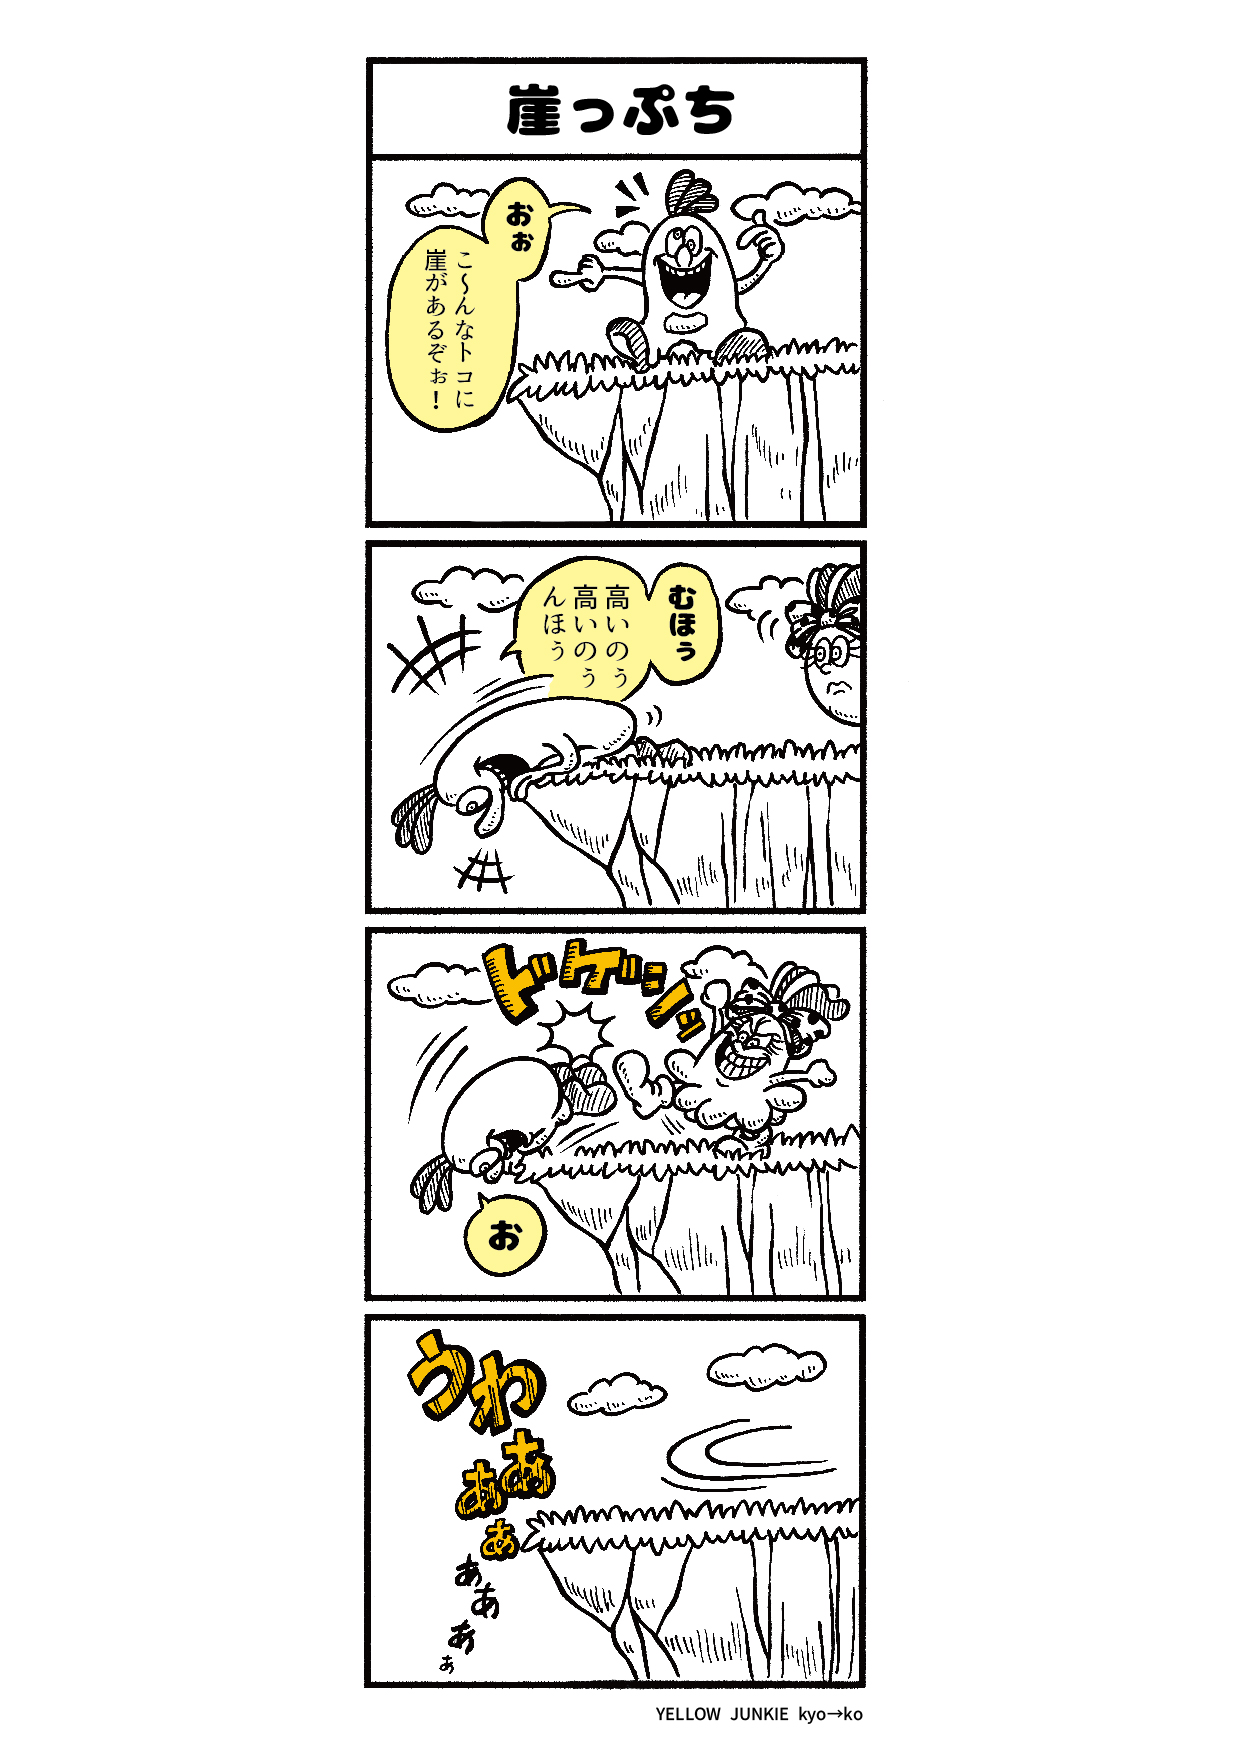 YELLOW JUNKIE「2話:崖っぷち」